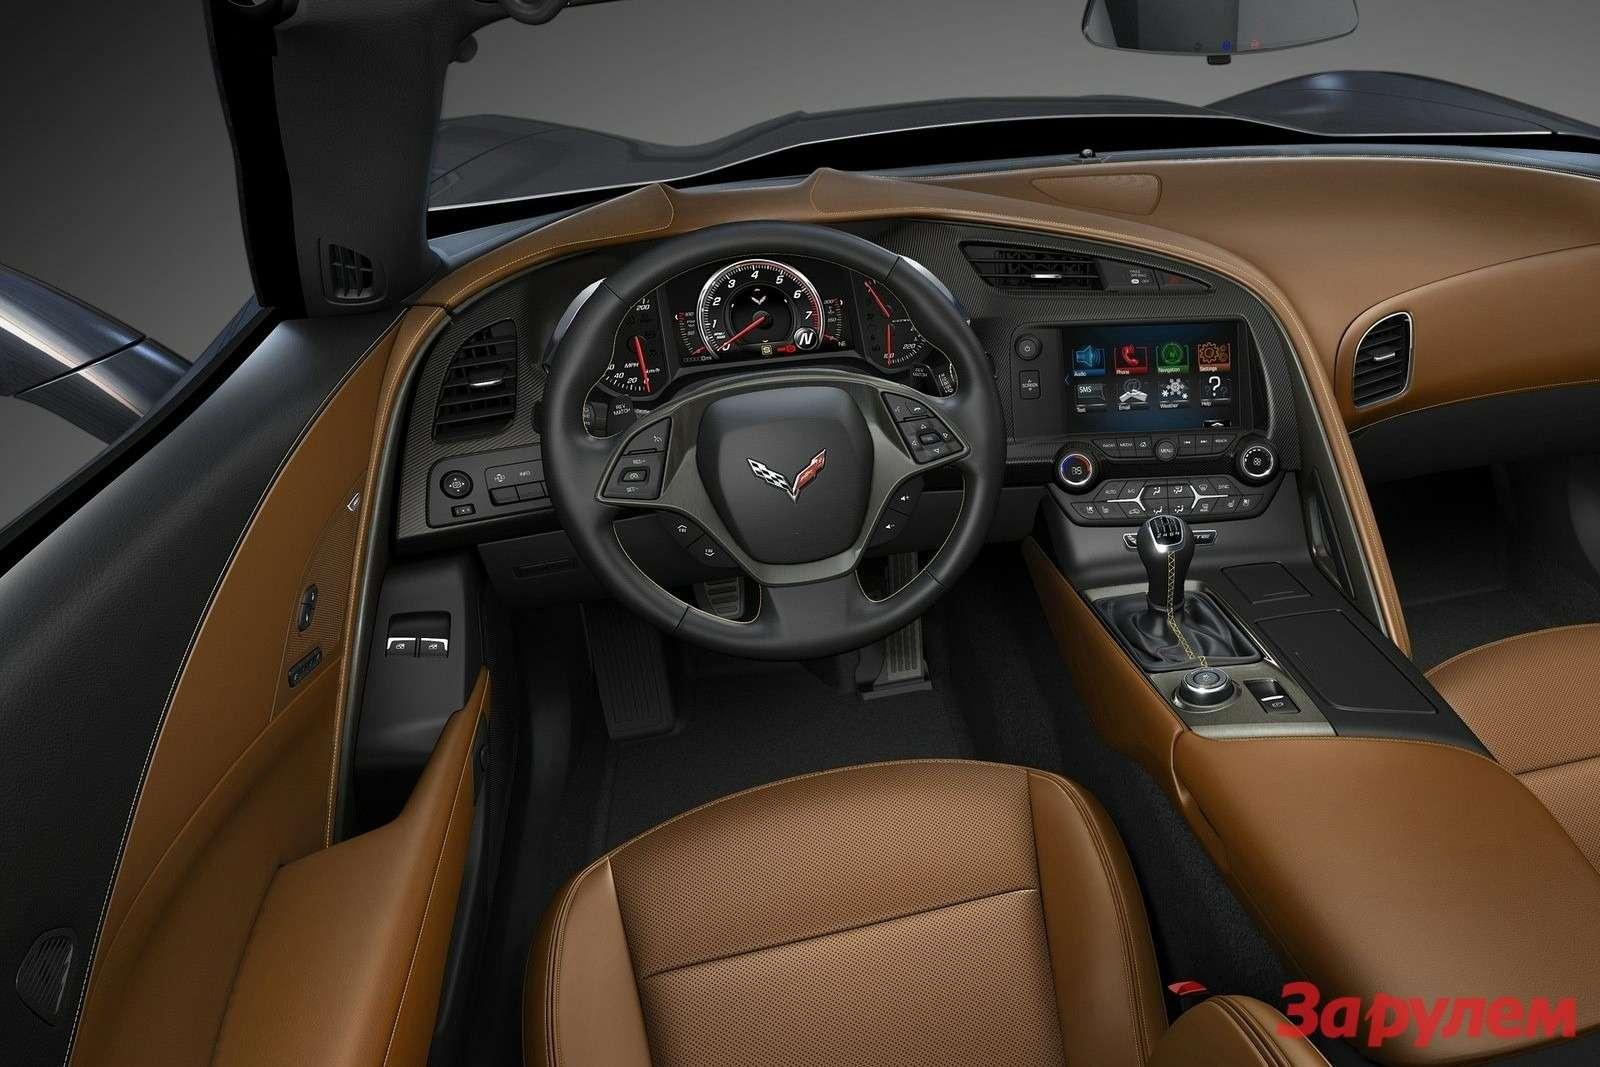 Chevrolet-Corvette_C7_Stingray_2014_1600x1200_wallpaper_18